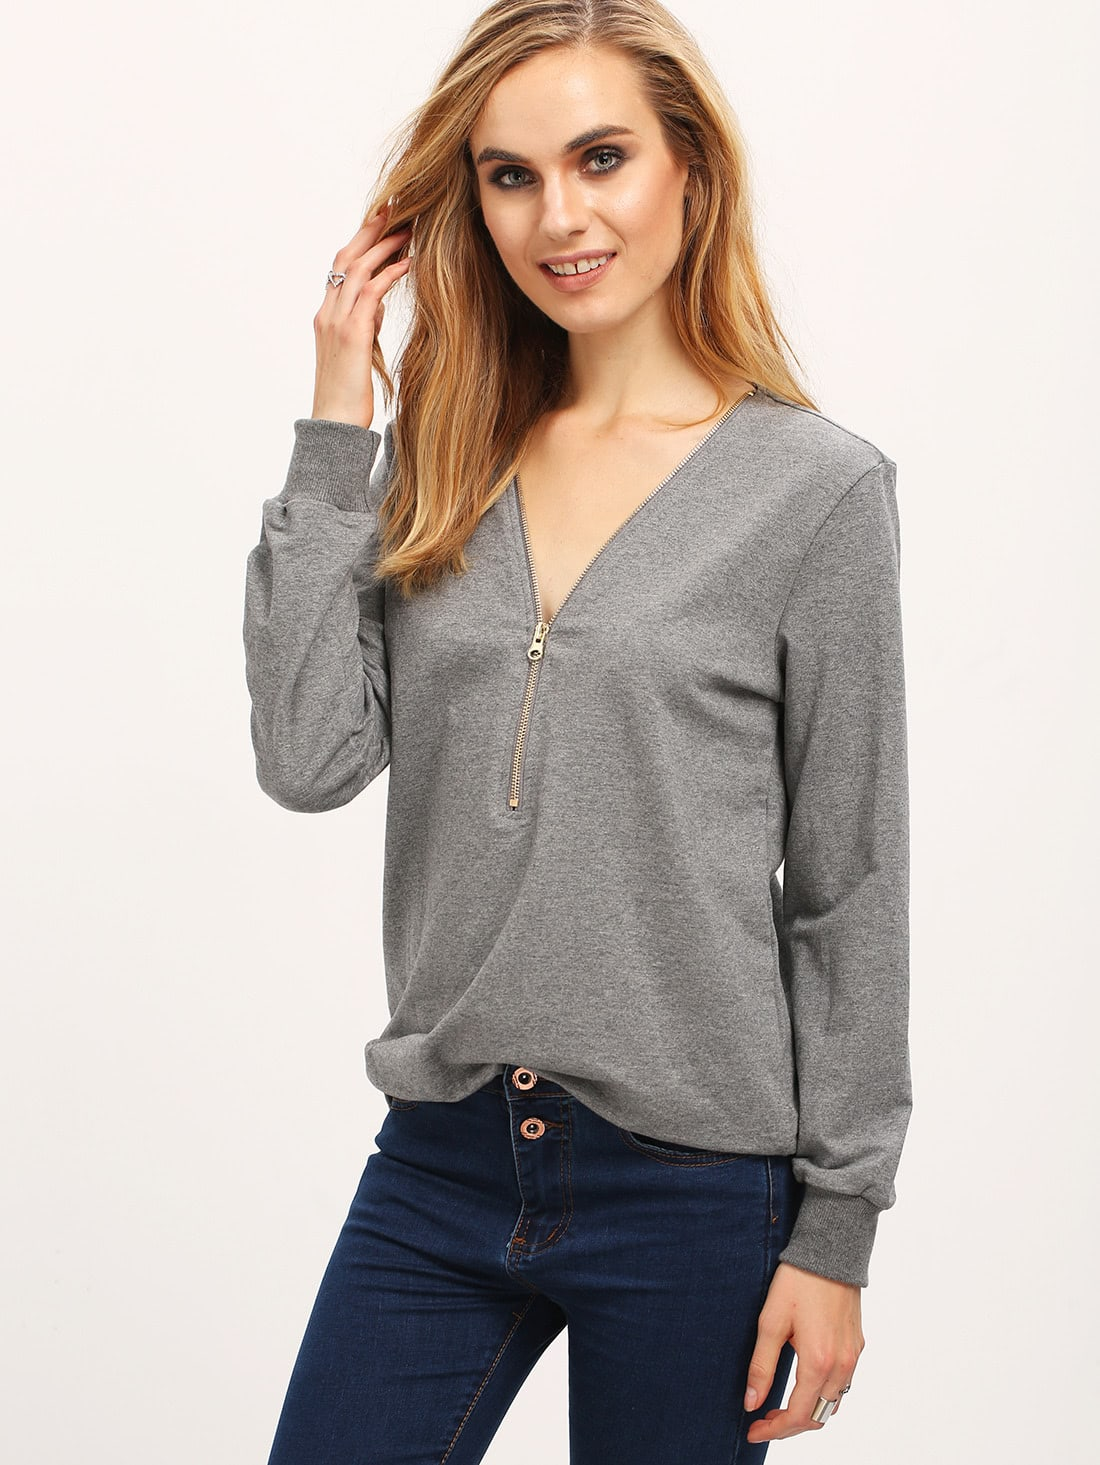 Grey Zipper V Neck T-Shirt tee160104714